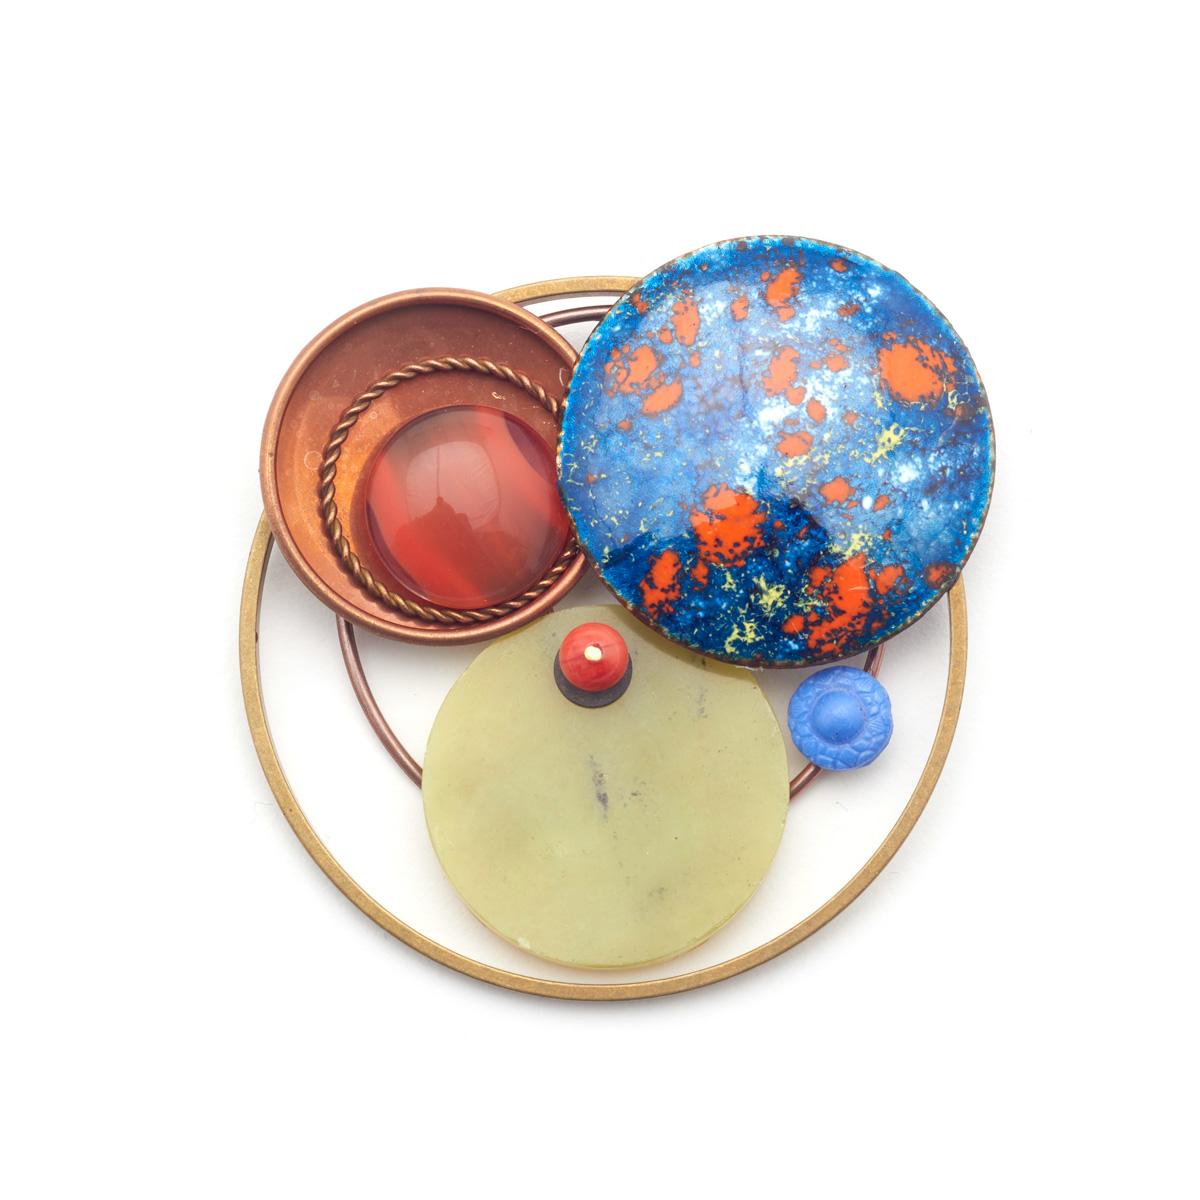 Vintage Planets brooch by Joli